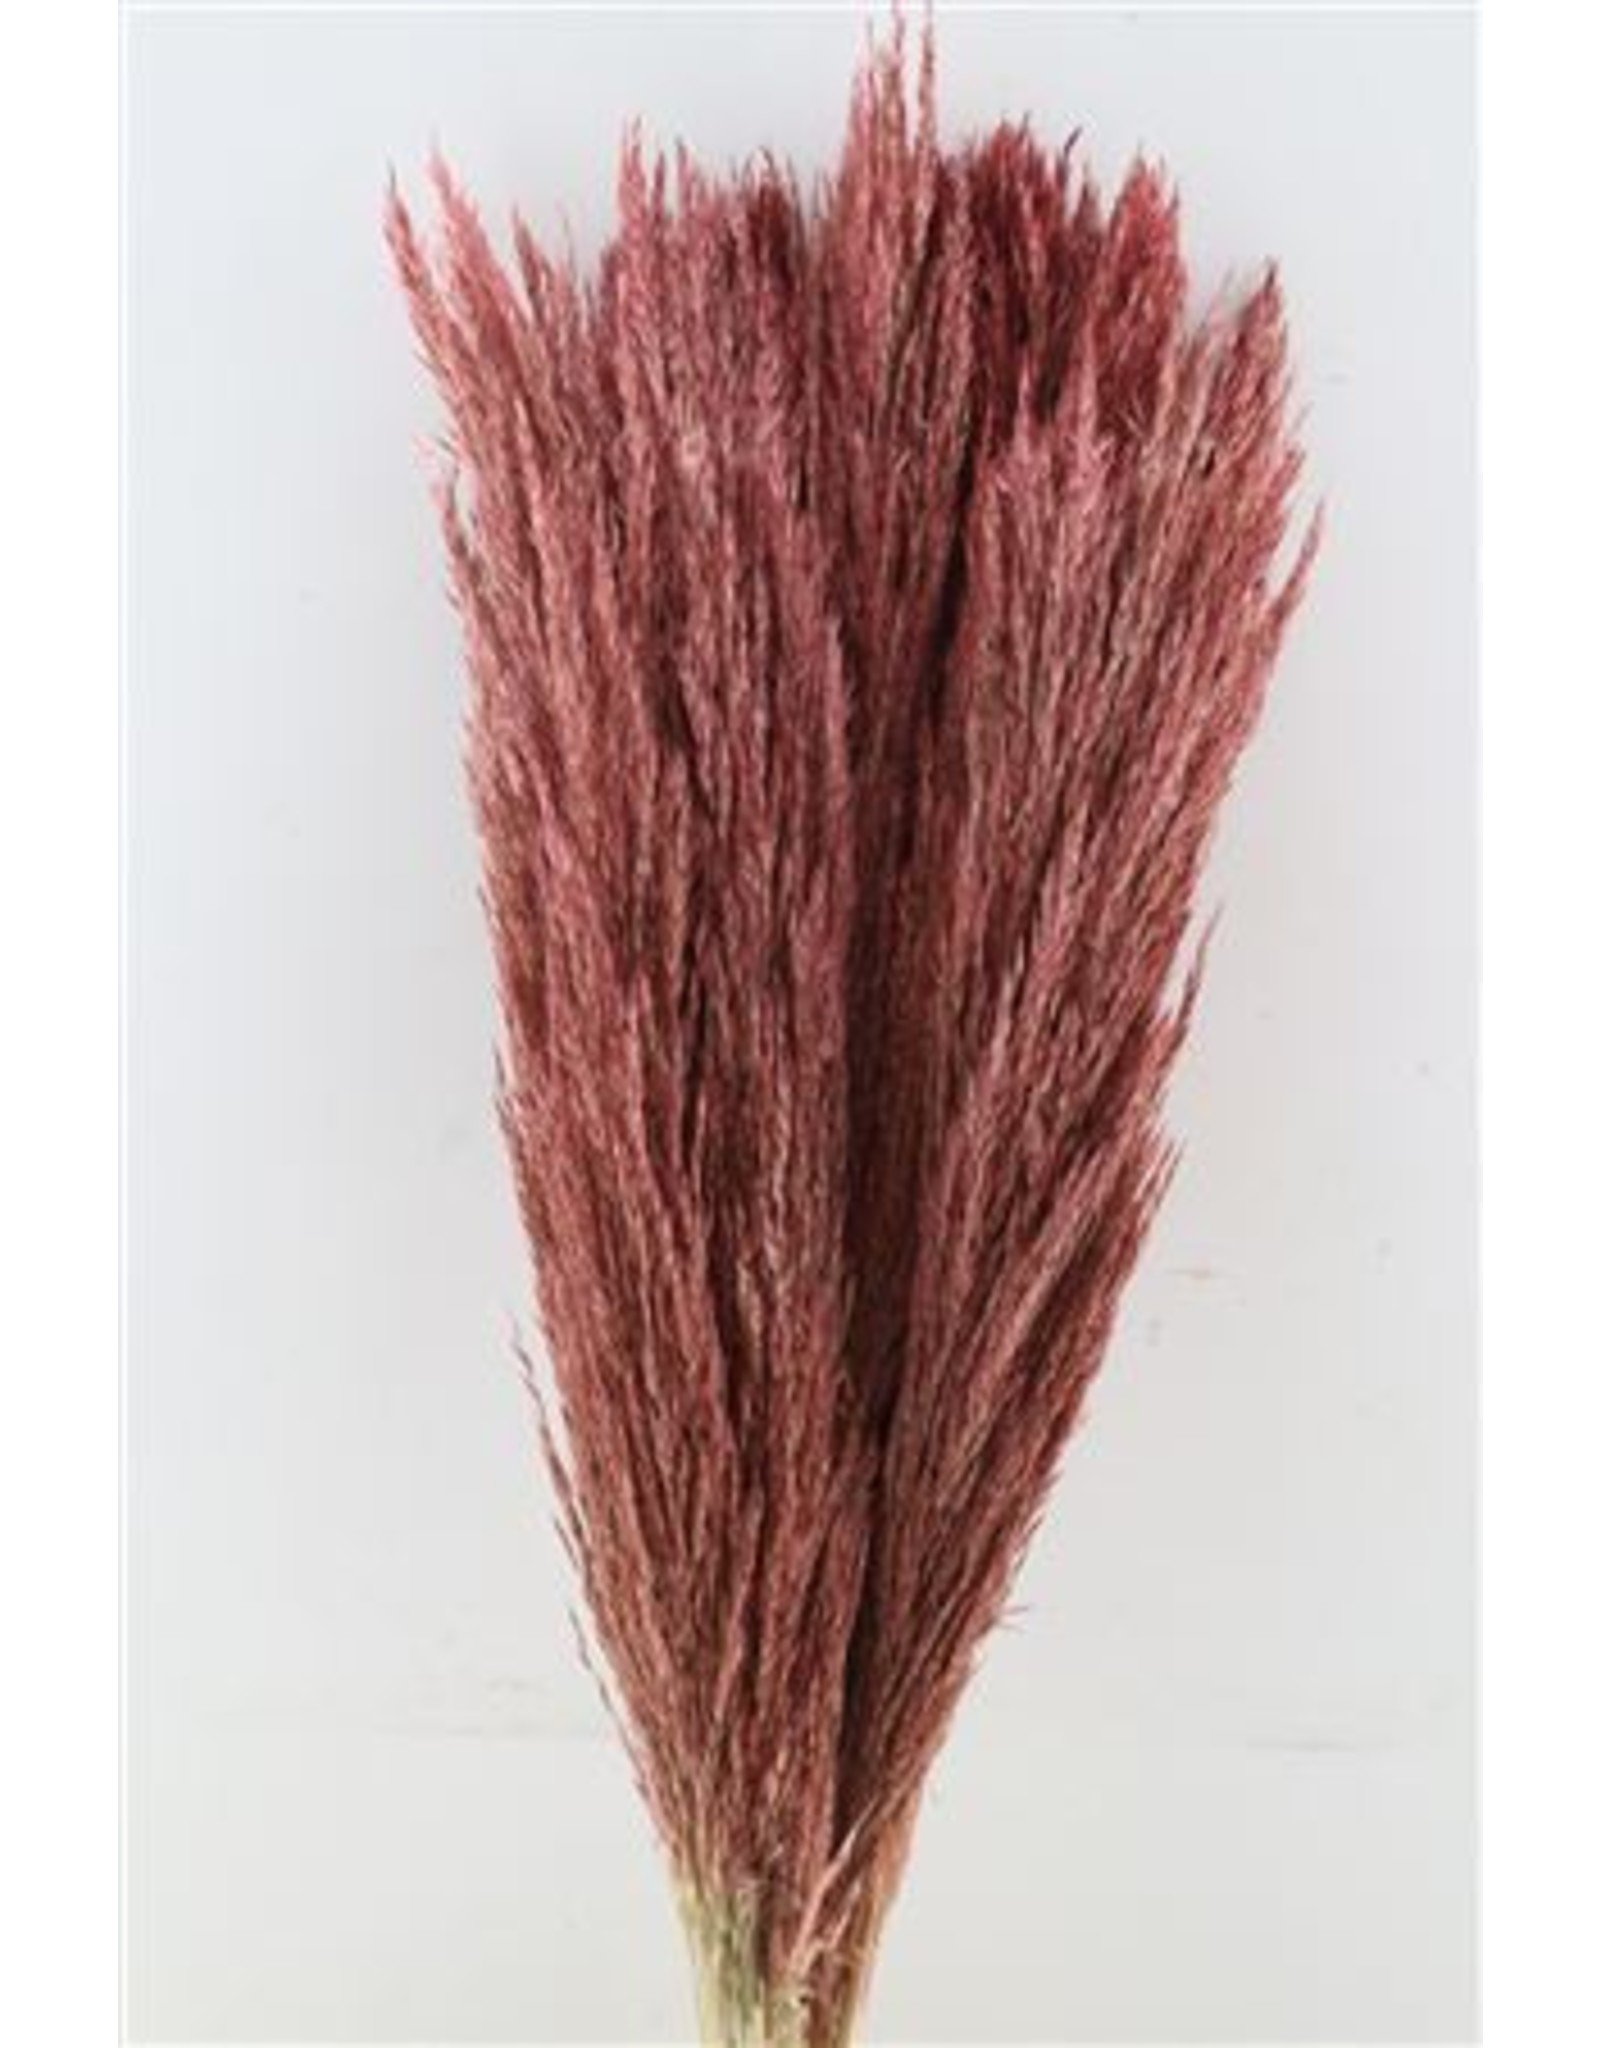 GF Dried Pampas Cane Arundo Donax L. Pink P. Stem x 50